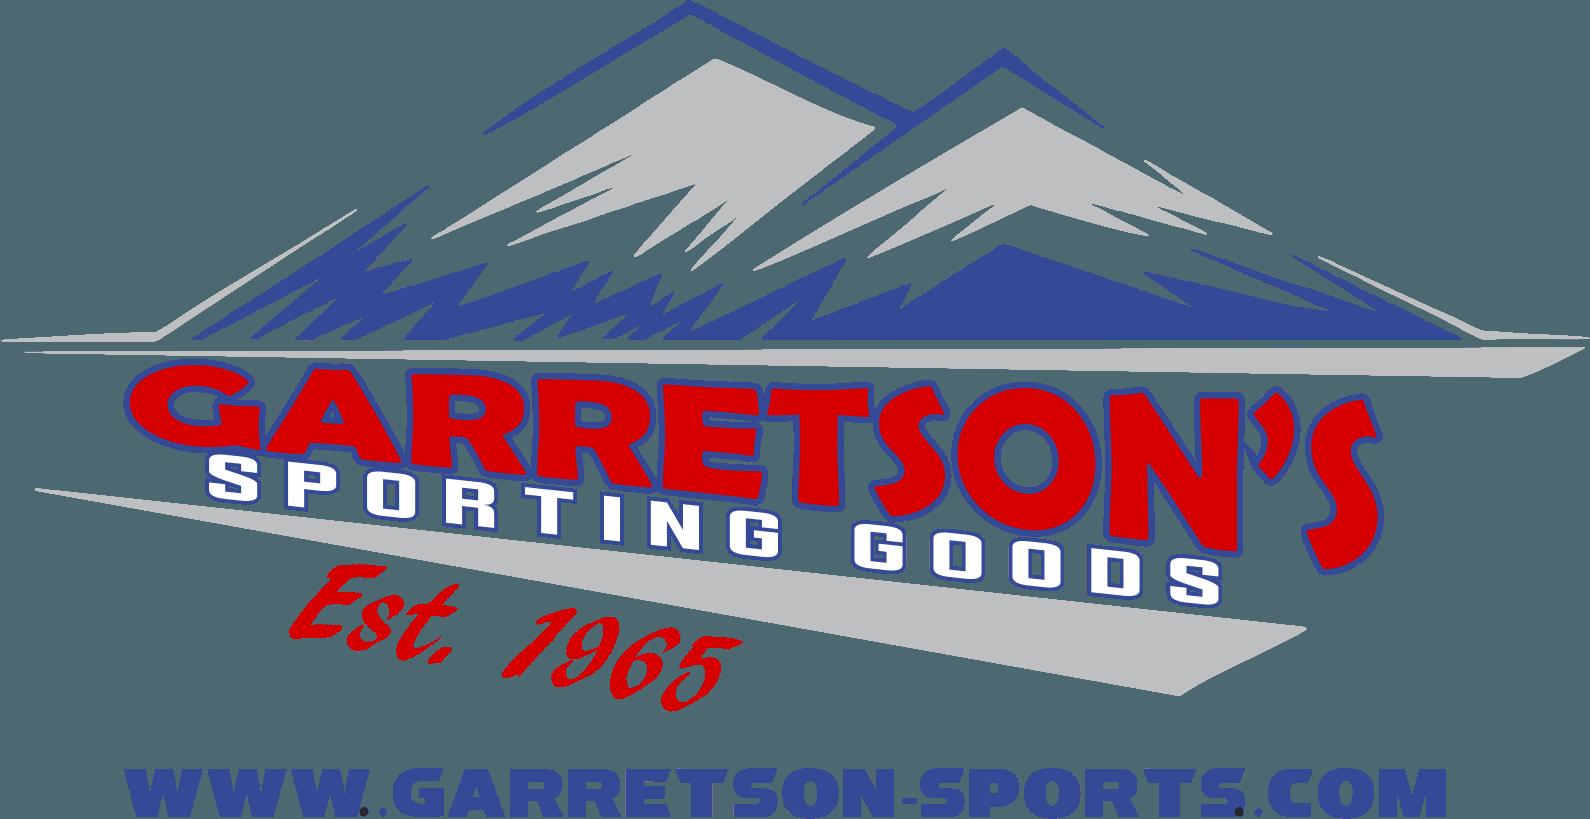 Garretson's Sports Center